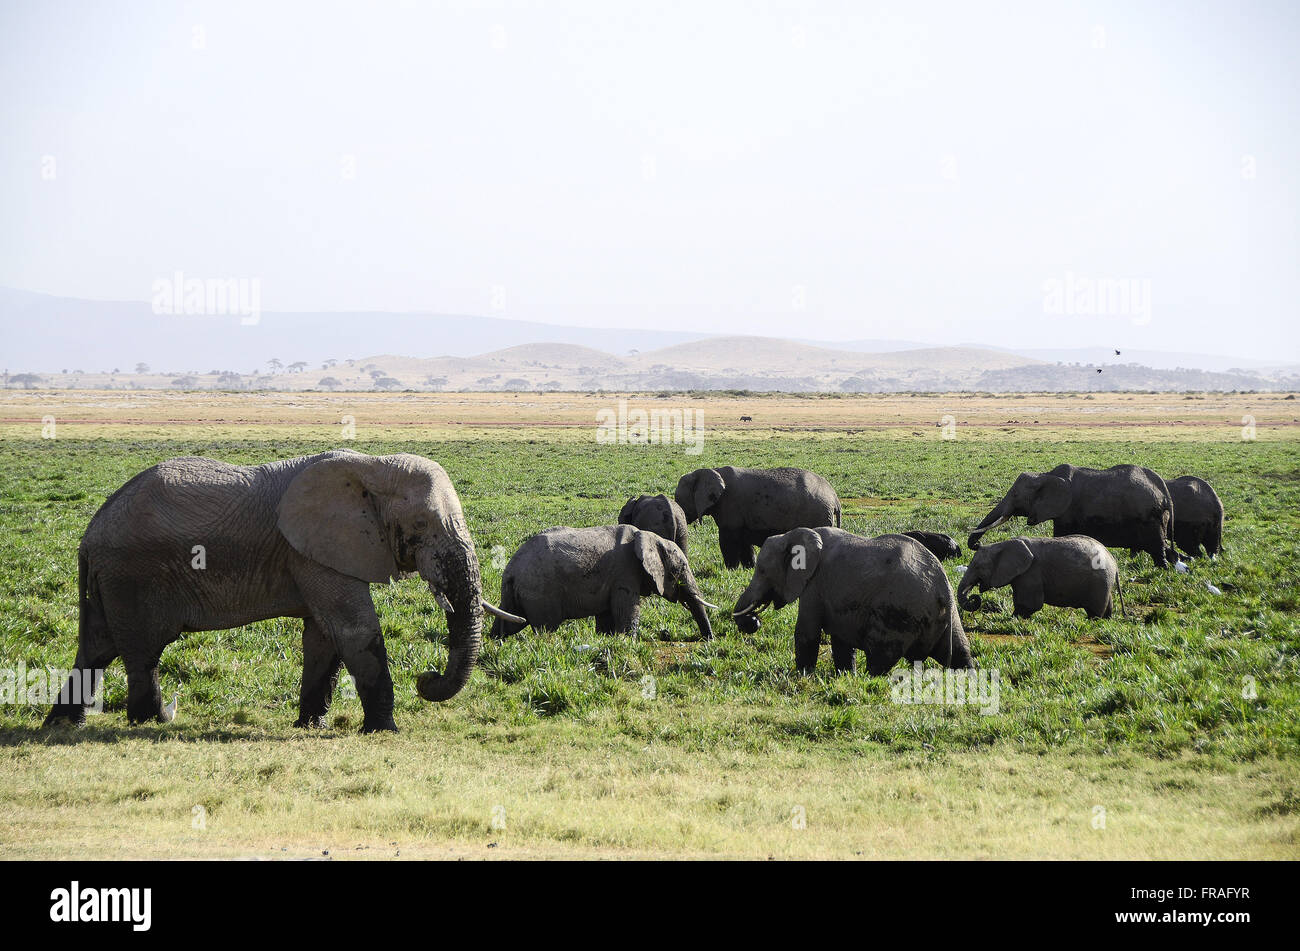 Elephants grazing in swamp of Amboseli National Park - Stock Image